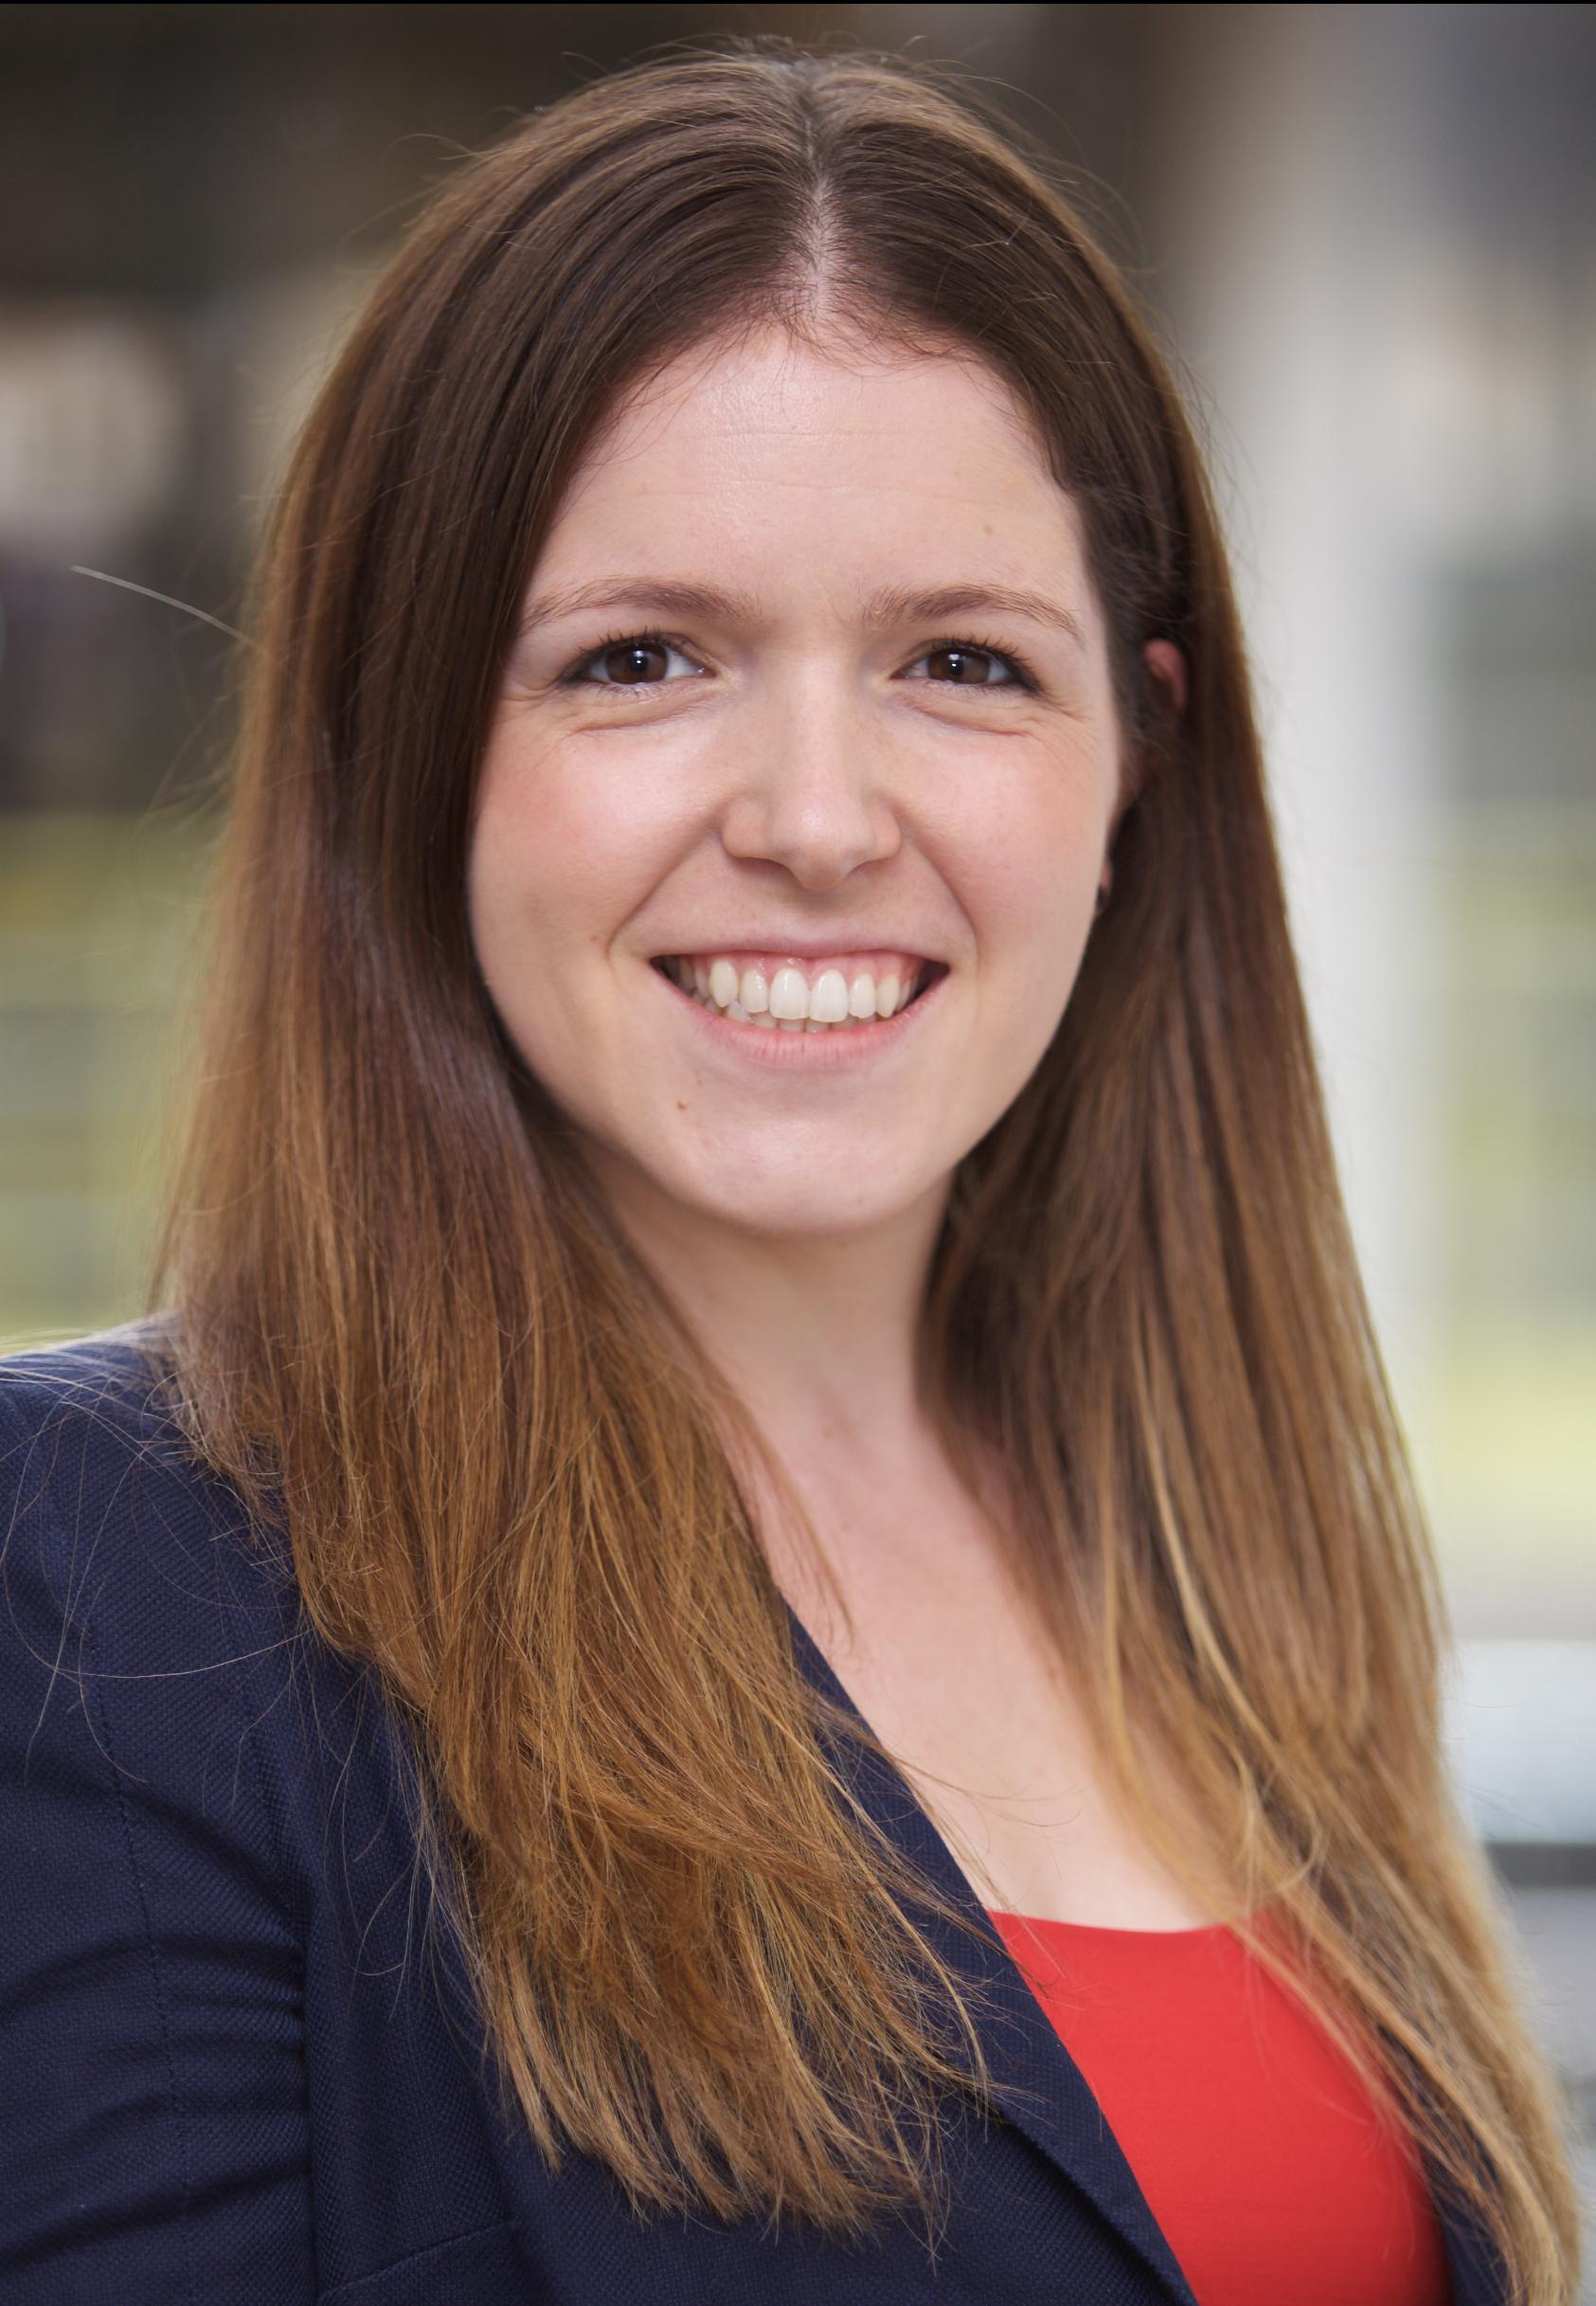 Yvette Pearson